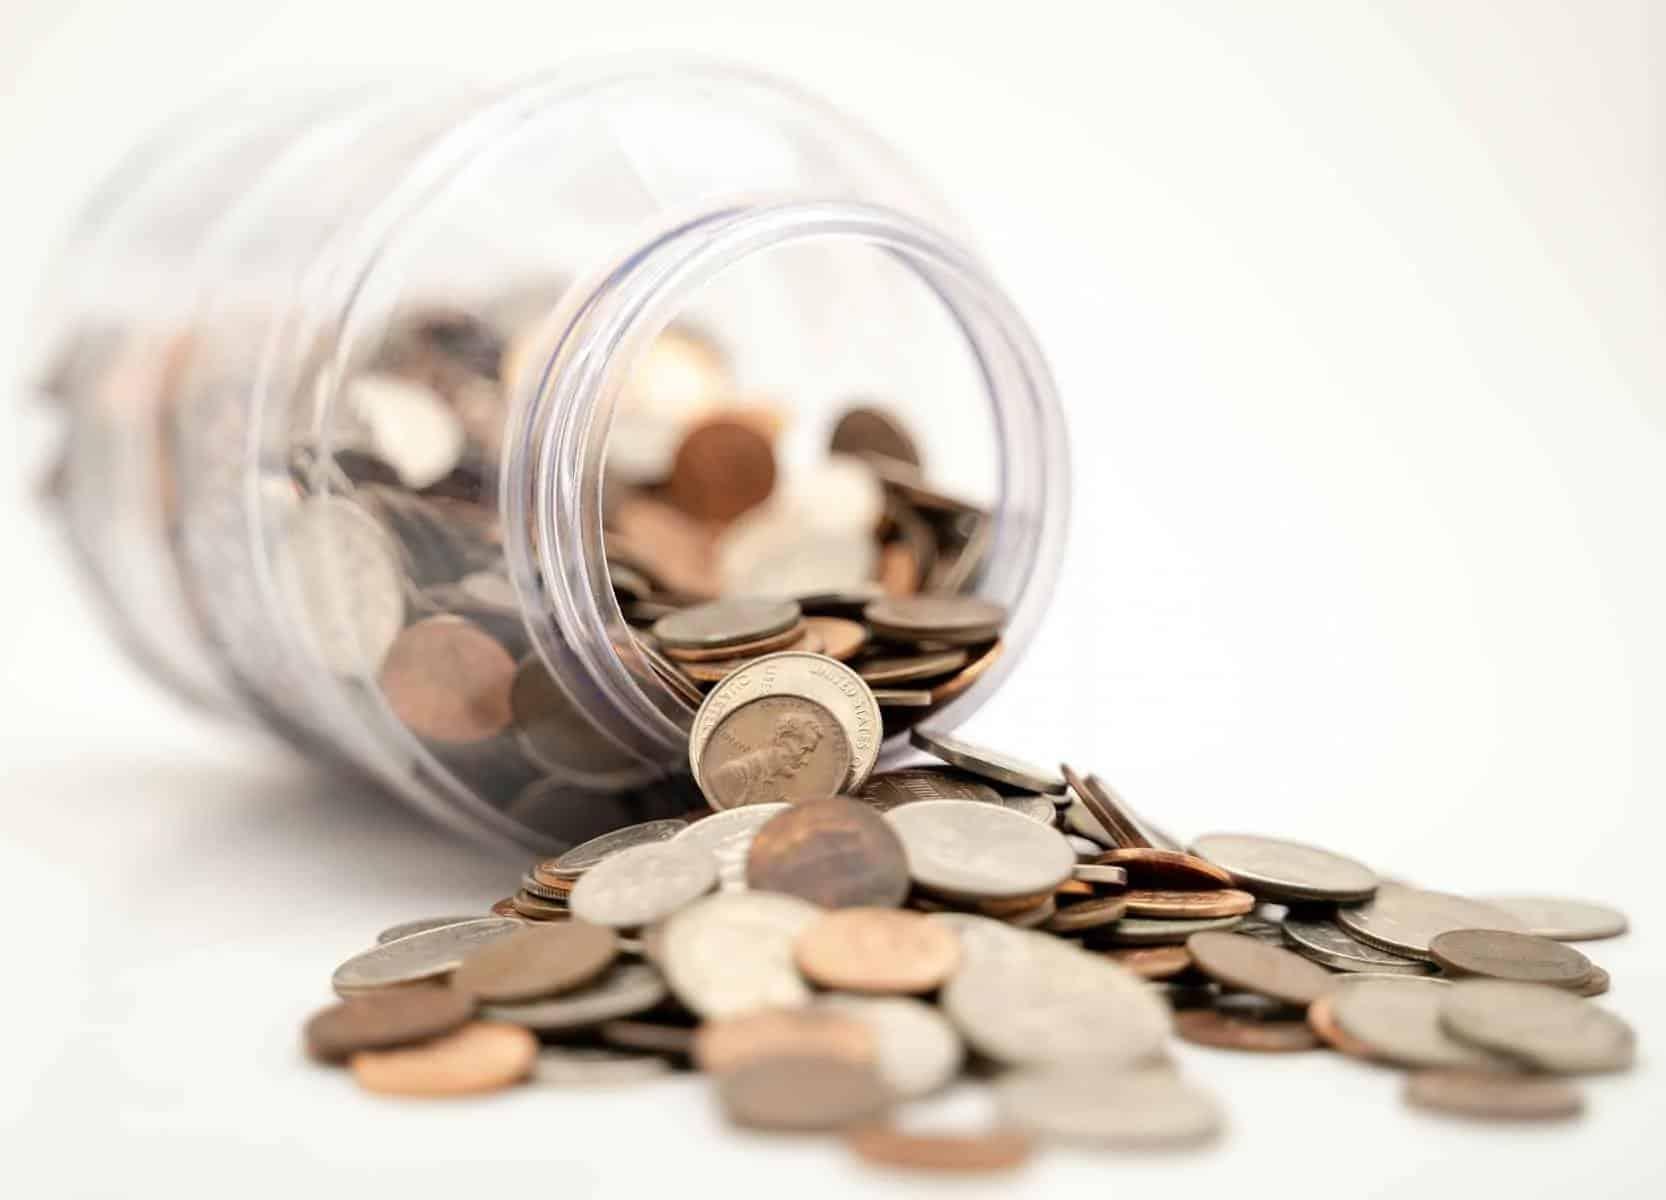 a pénz opcióról bináris opciók indikátorai pontos jelekkel